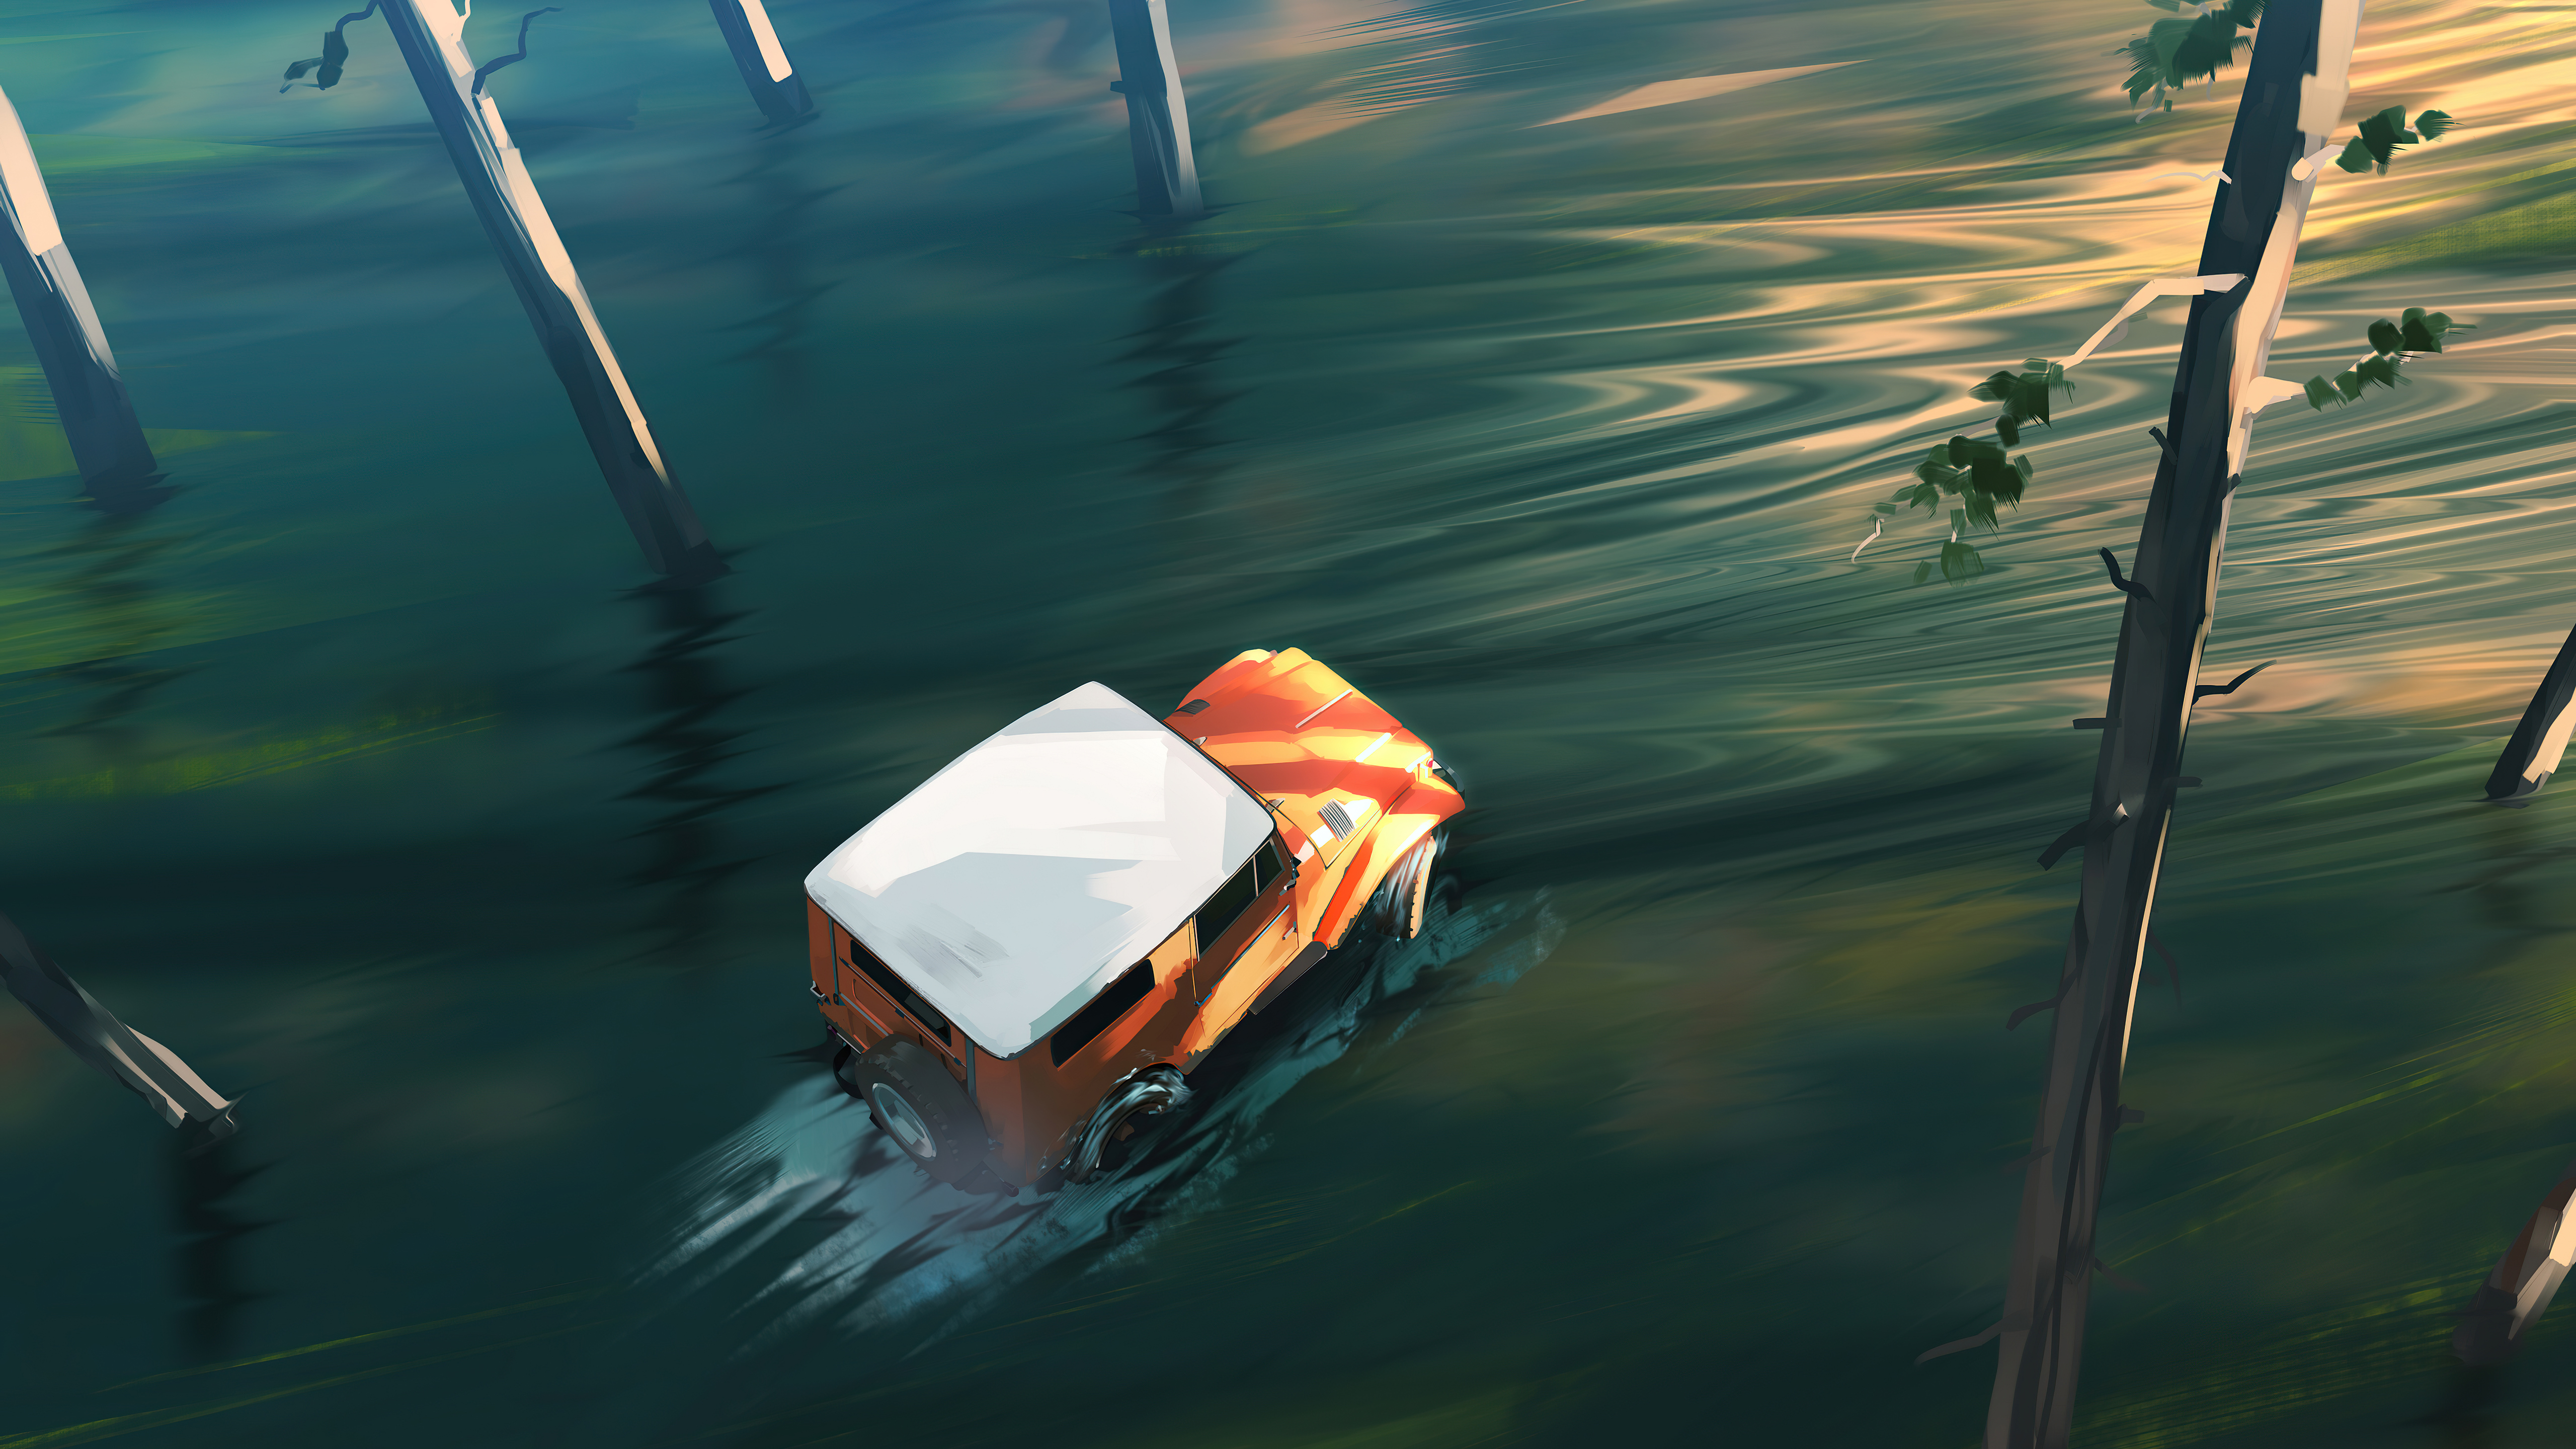 offroading jeep lake 4k 1618130520 - Offroading Jeep Lake 4k - Offroading Jeep Lake 4k wallpapers